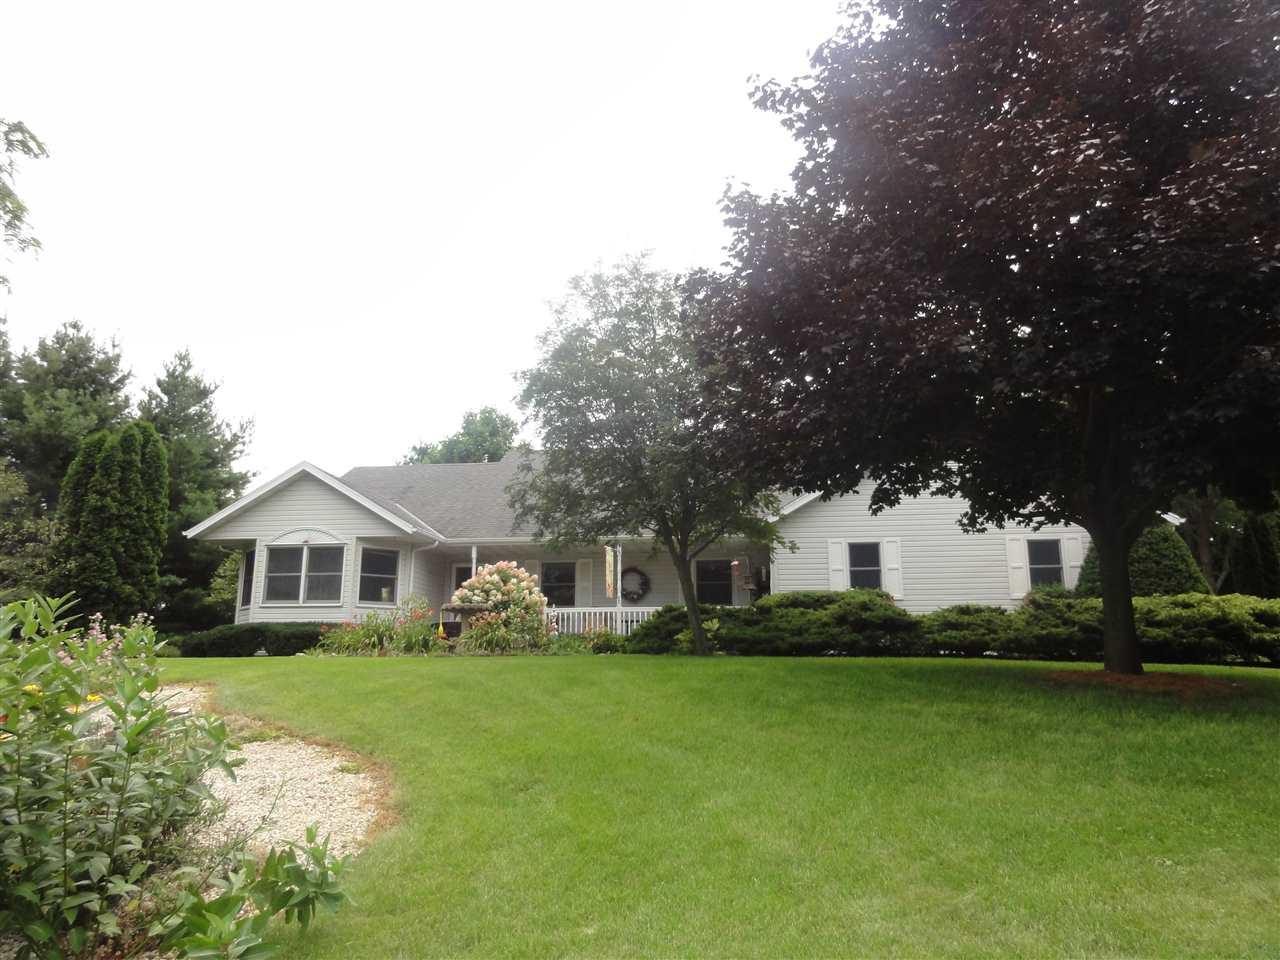 5609 W Partridge Hollow Dr, Janesville, WI 53548